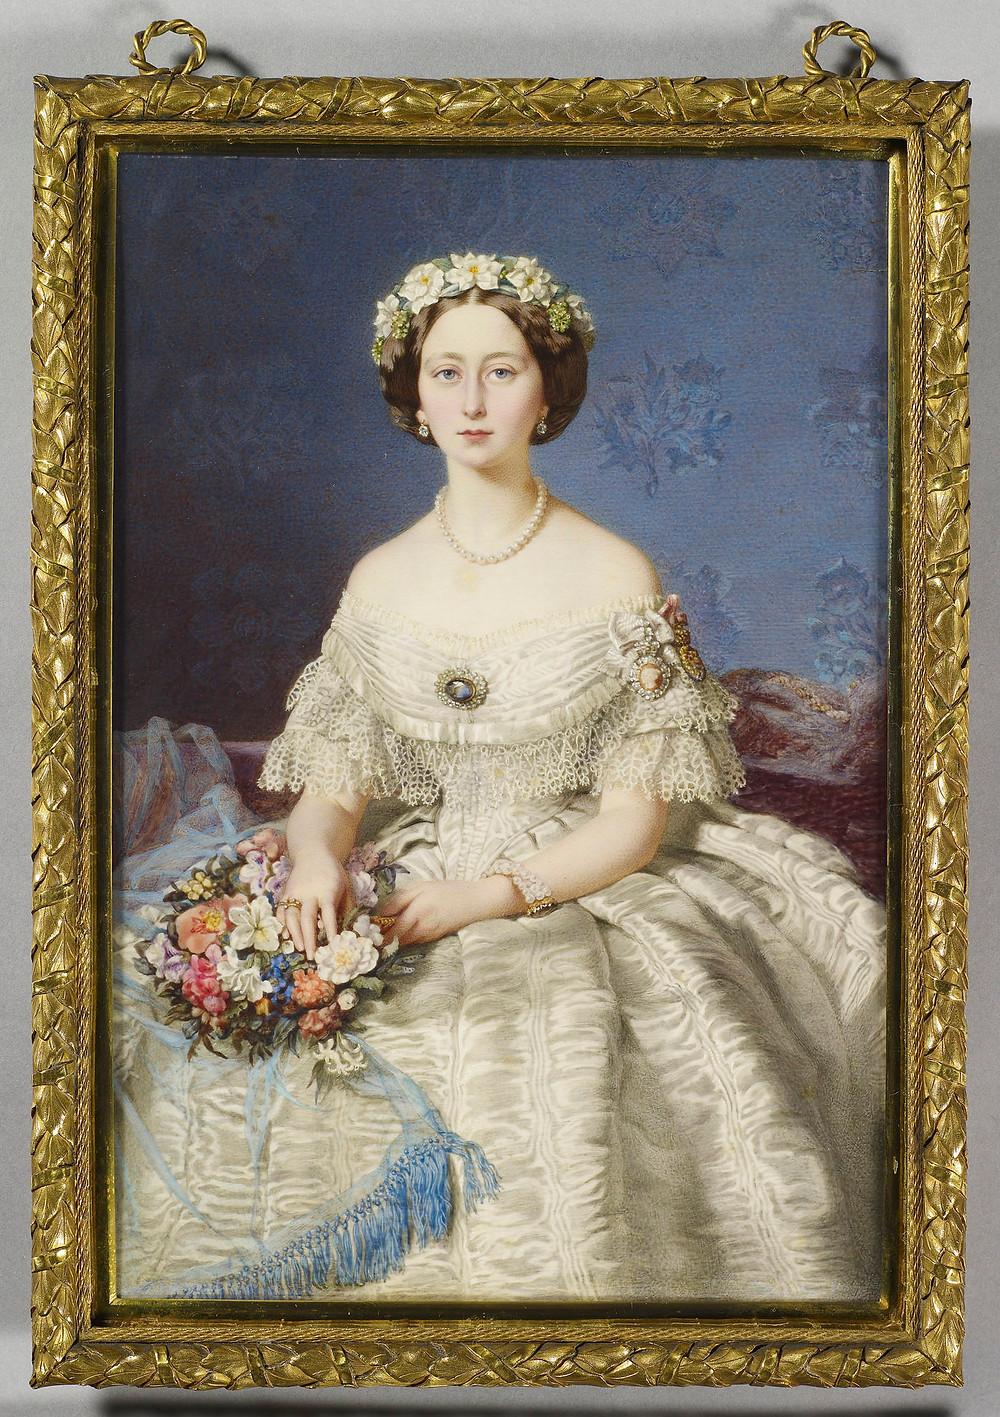 Princess Alice by EDUARDO DE MOIRA 1860 Royal Collection Trust/© Her Majesty Queen Elizabeth II 2020